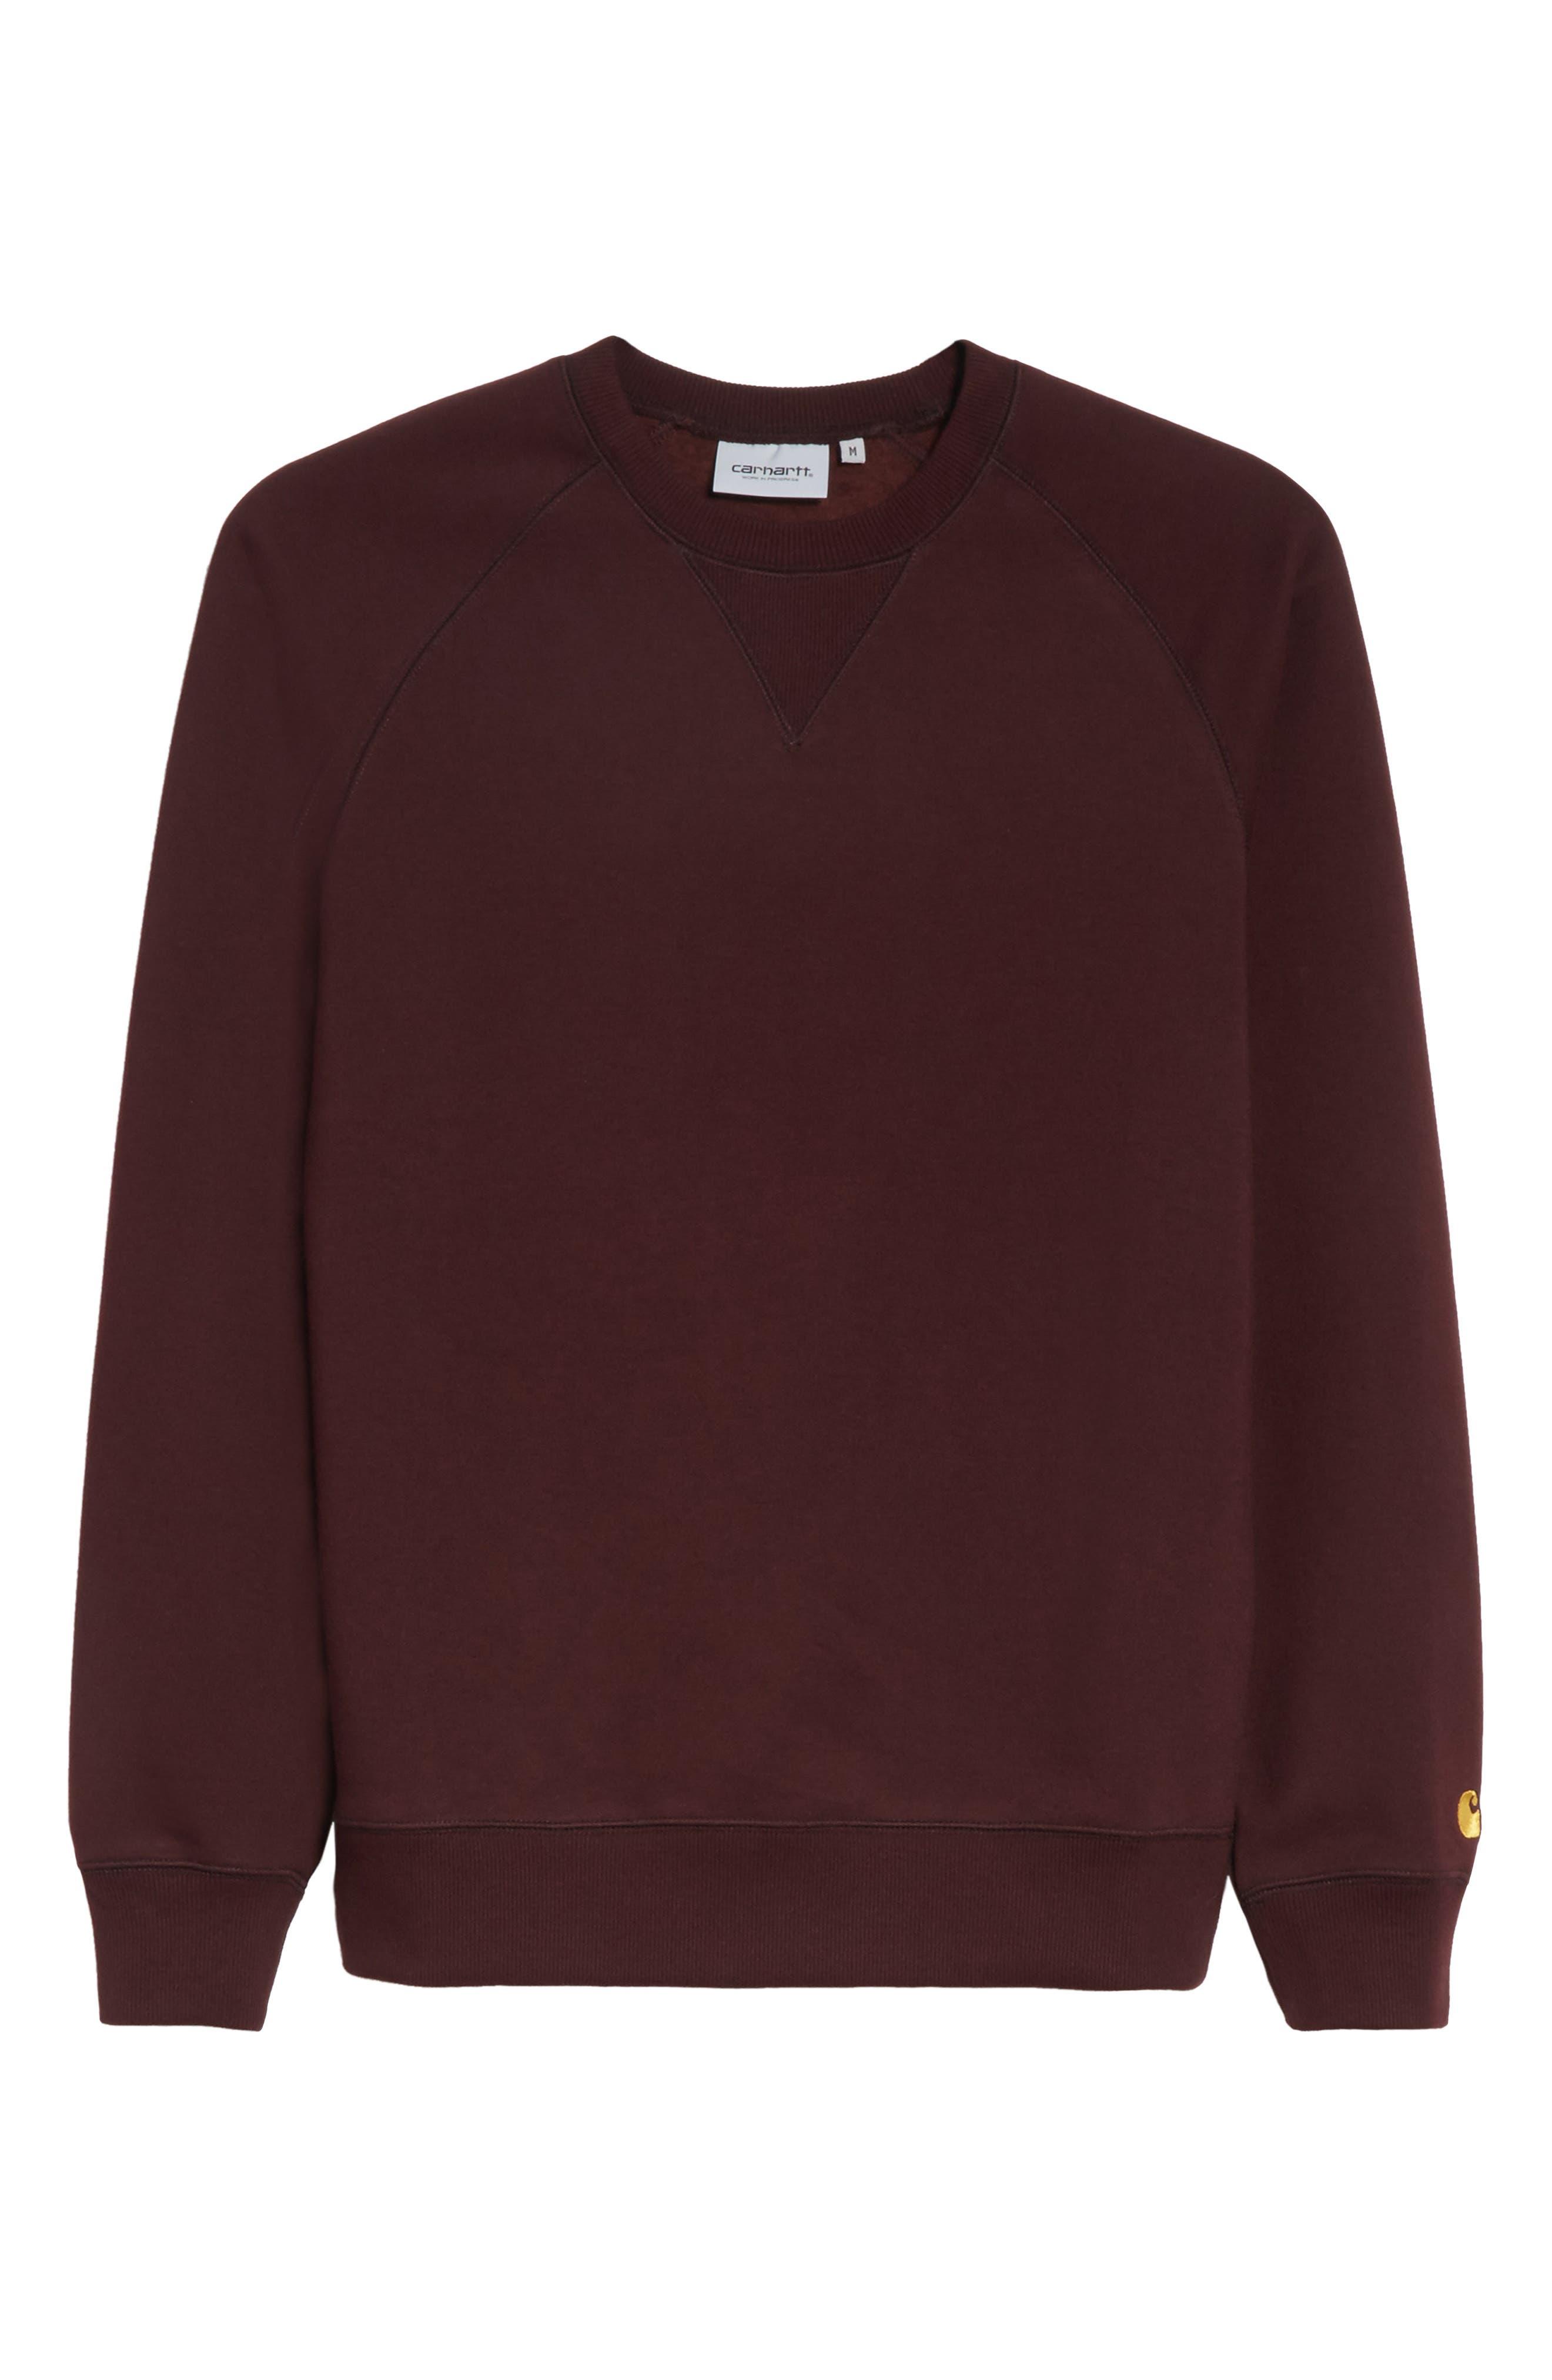 Crewneck Sweatshirt,                             Alternate thumbnail 6, color,                             930